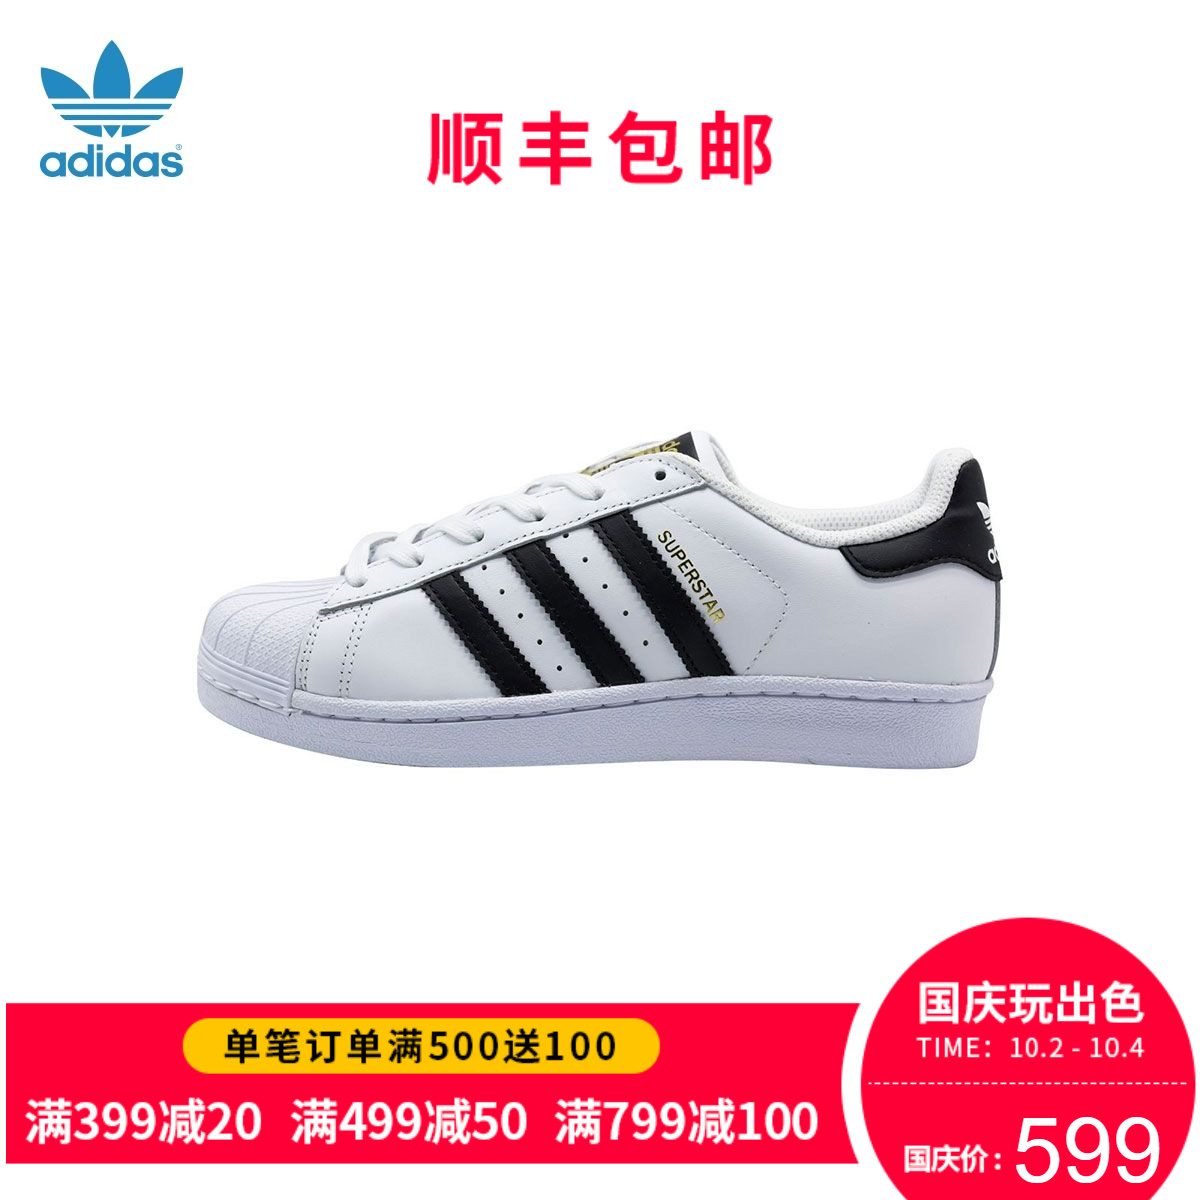 Adidas阿迪达斯贝壳头男大童三叶草儿童鞋SUPERSTAR J2018夏